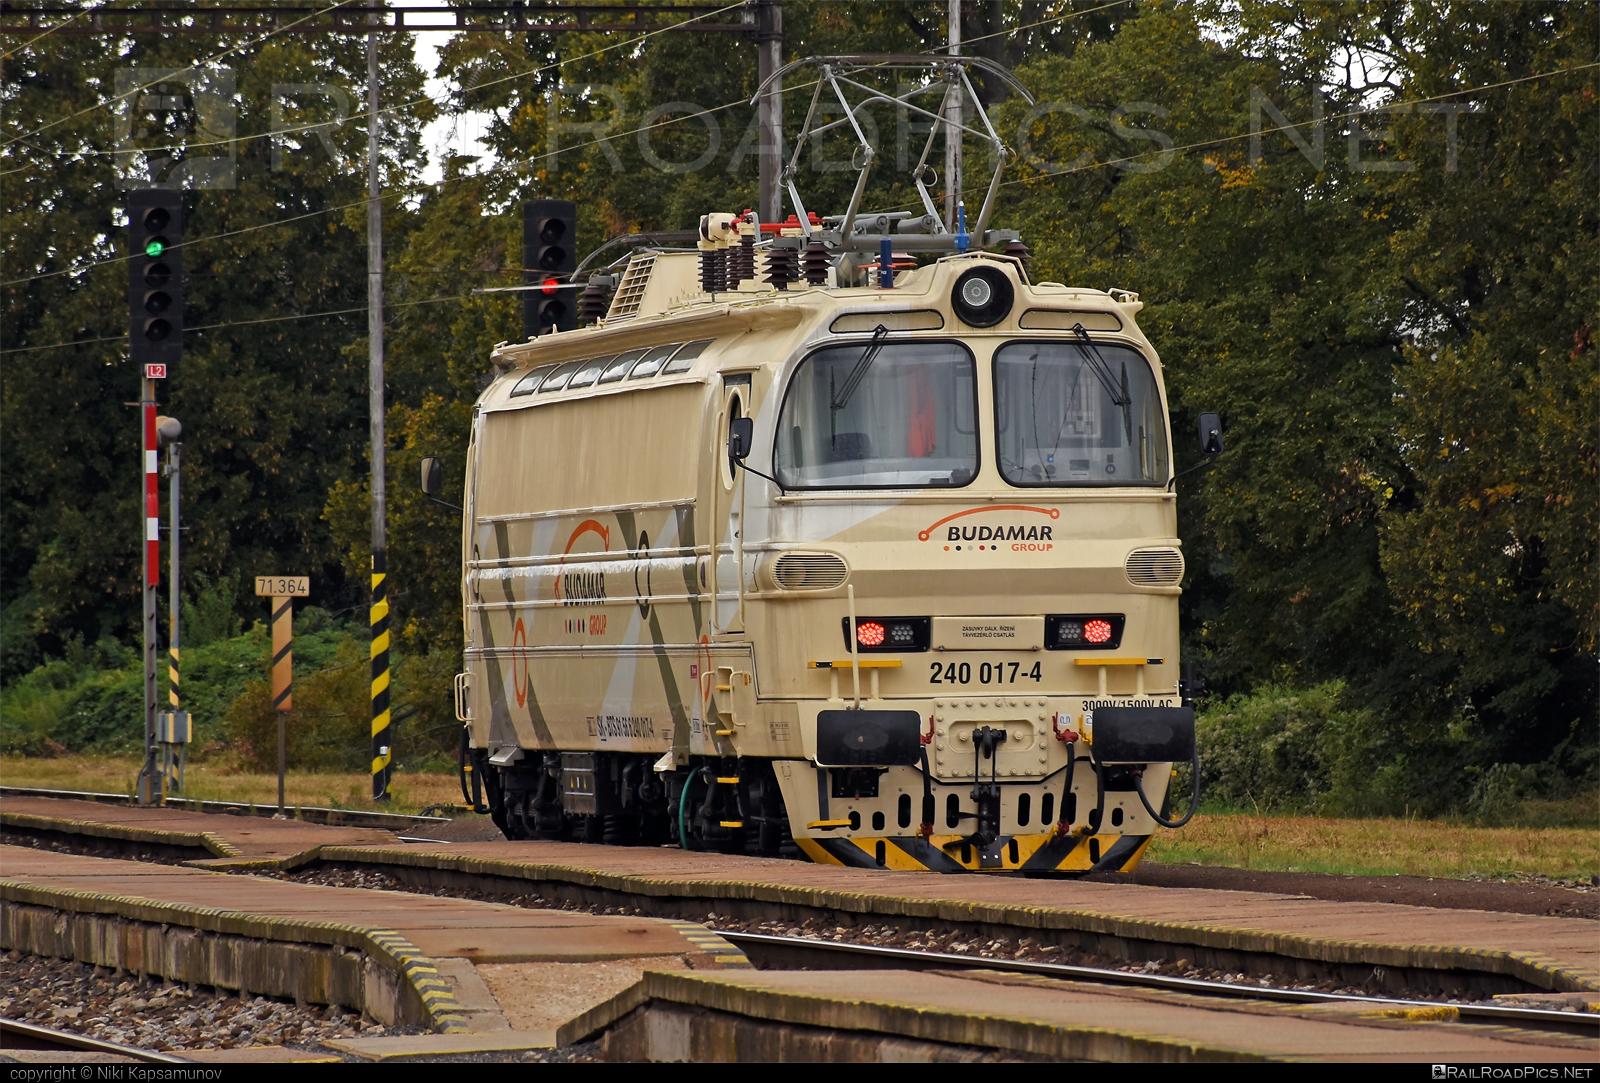 Škoda 47E - 240 017-4 operated by LOKORAIL, a.s. #BulkTransshipmentSlovakia #bts #budamar #laminatka #locomotive240 #lokorail #lrl #skoda #skoda47e